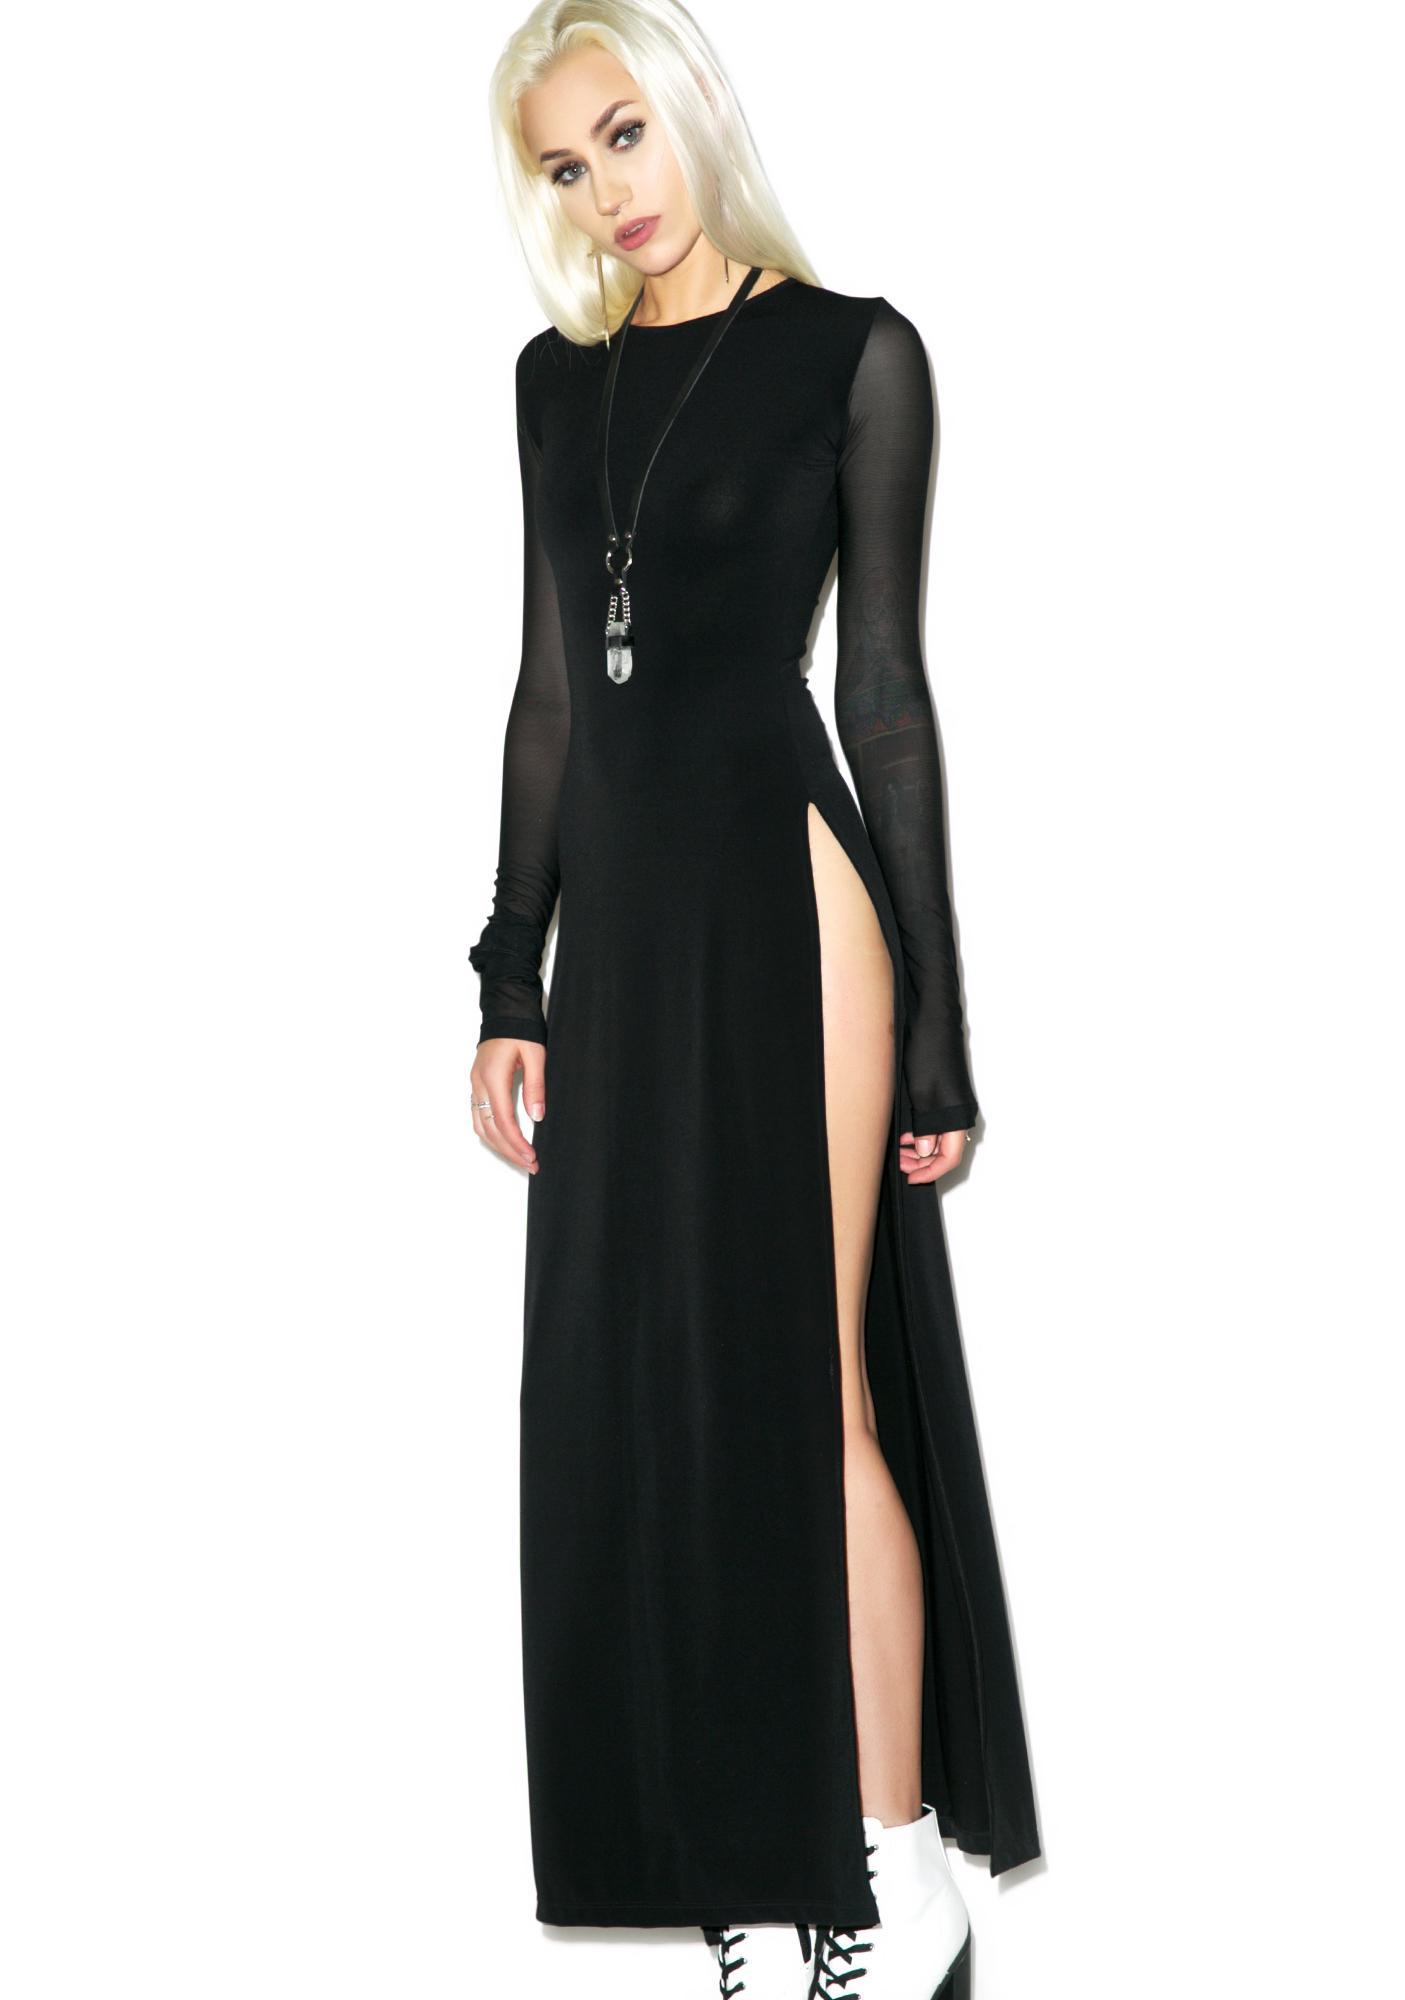 Black Wednesday Label Maxi Dress